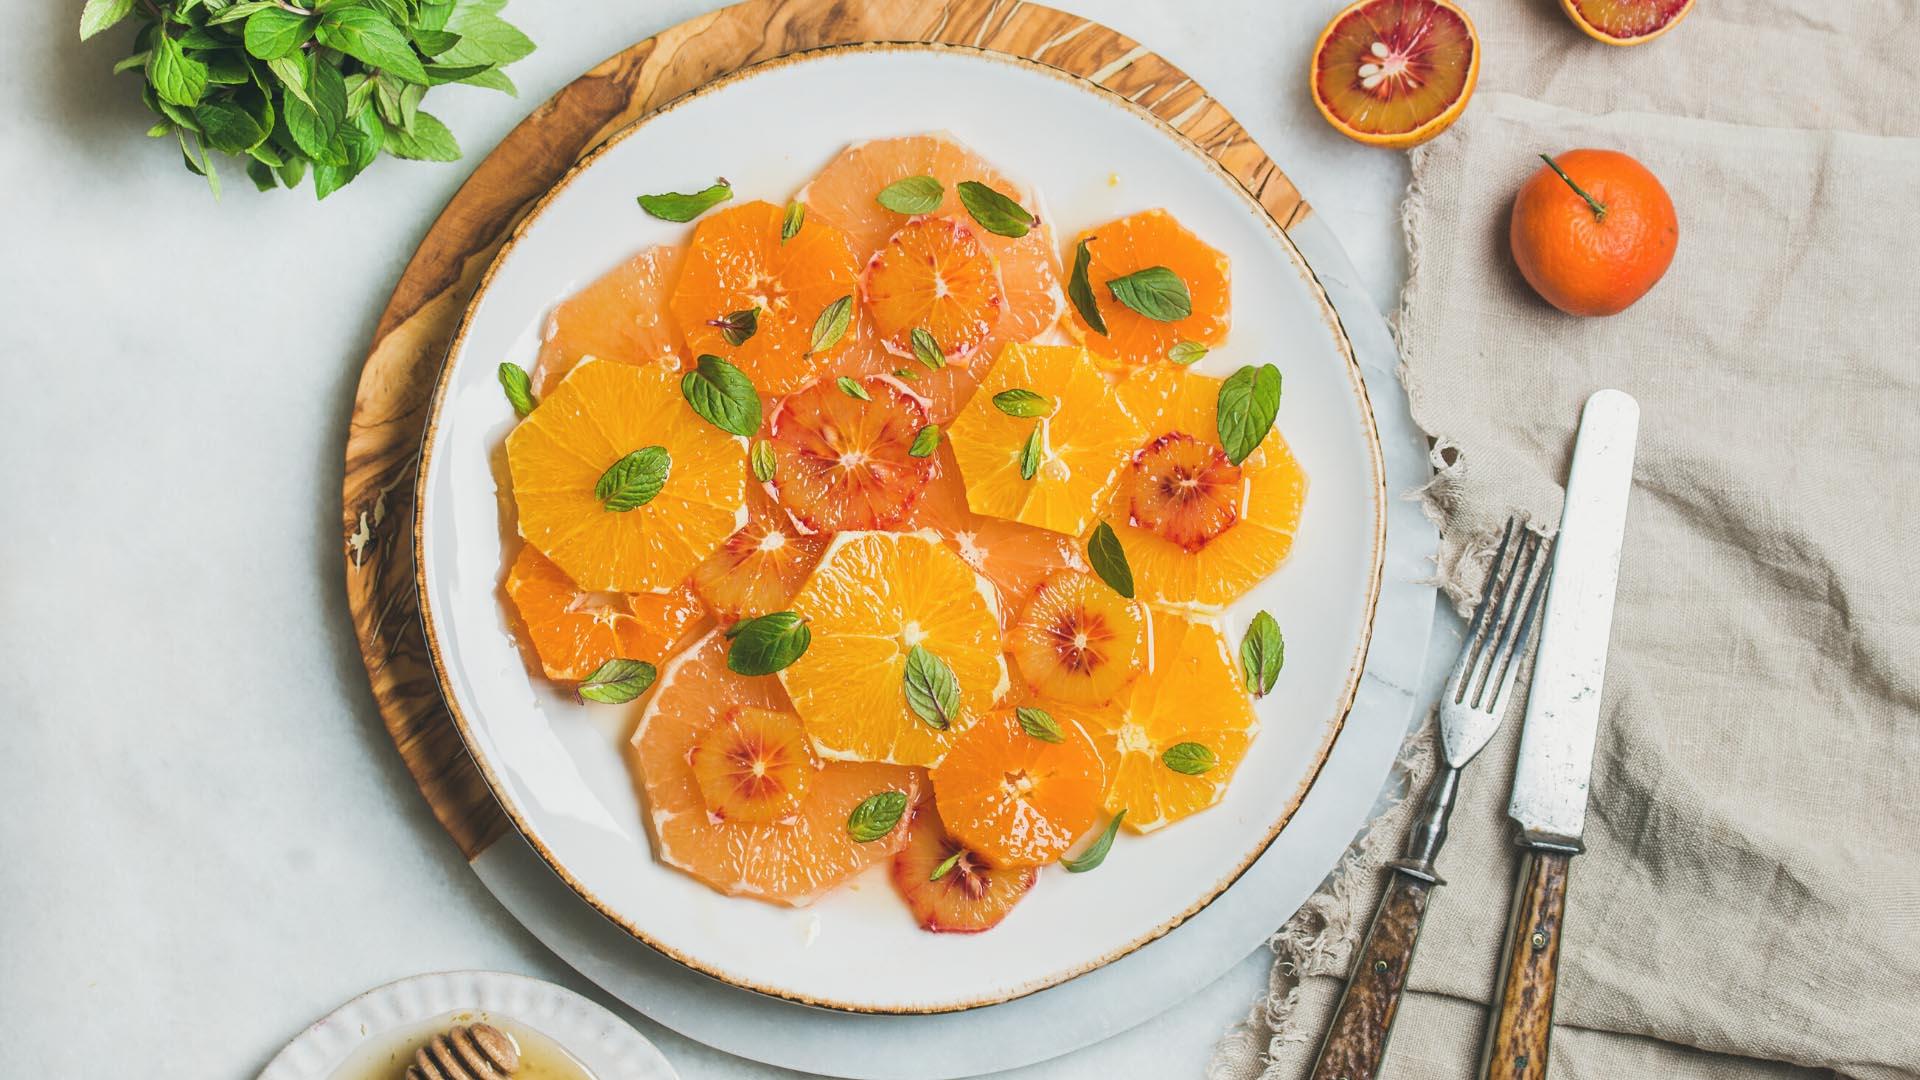 Image of Citrus Fruit Salad